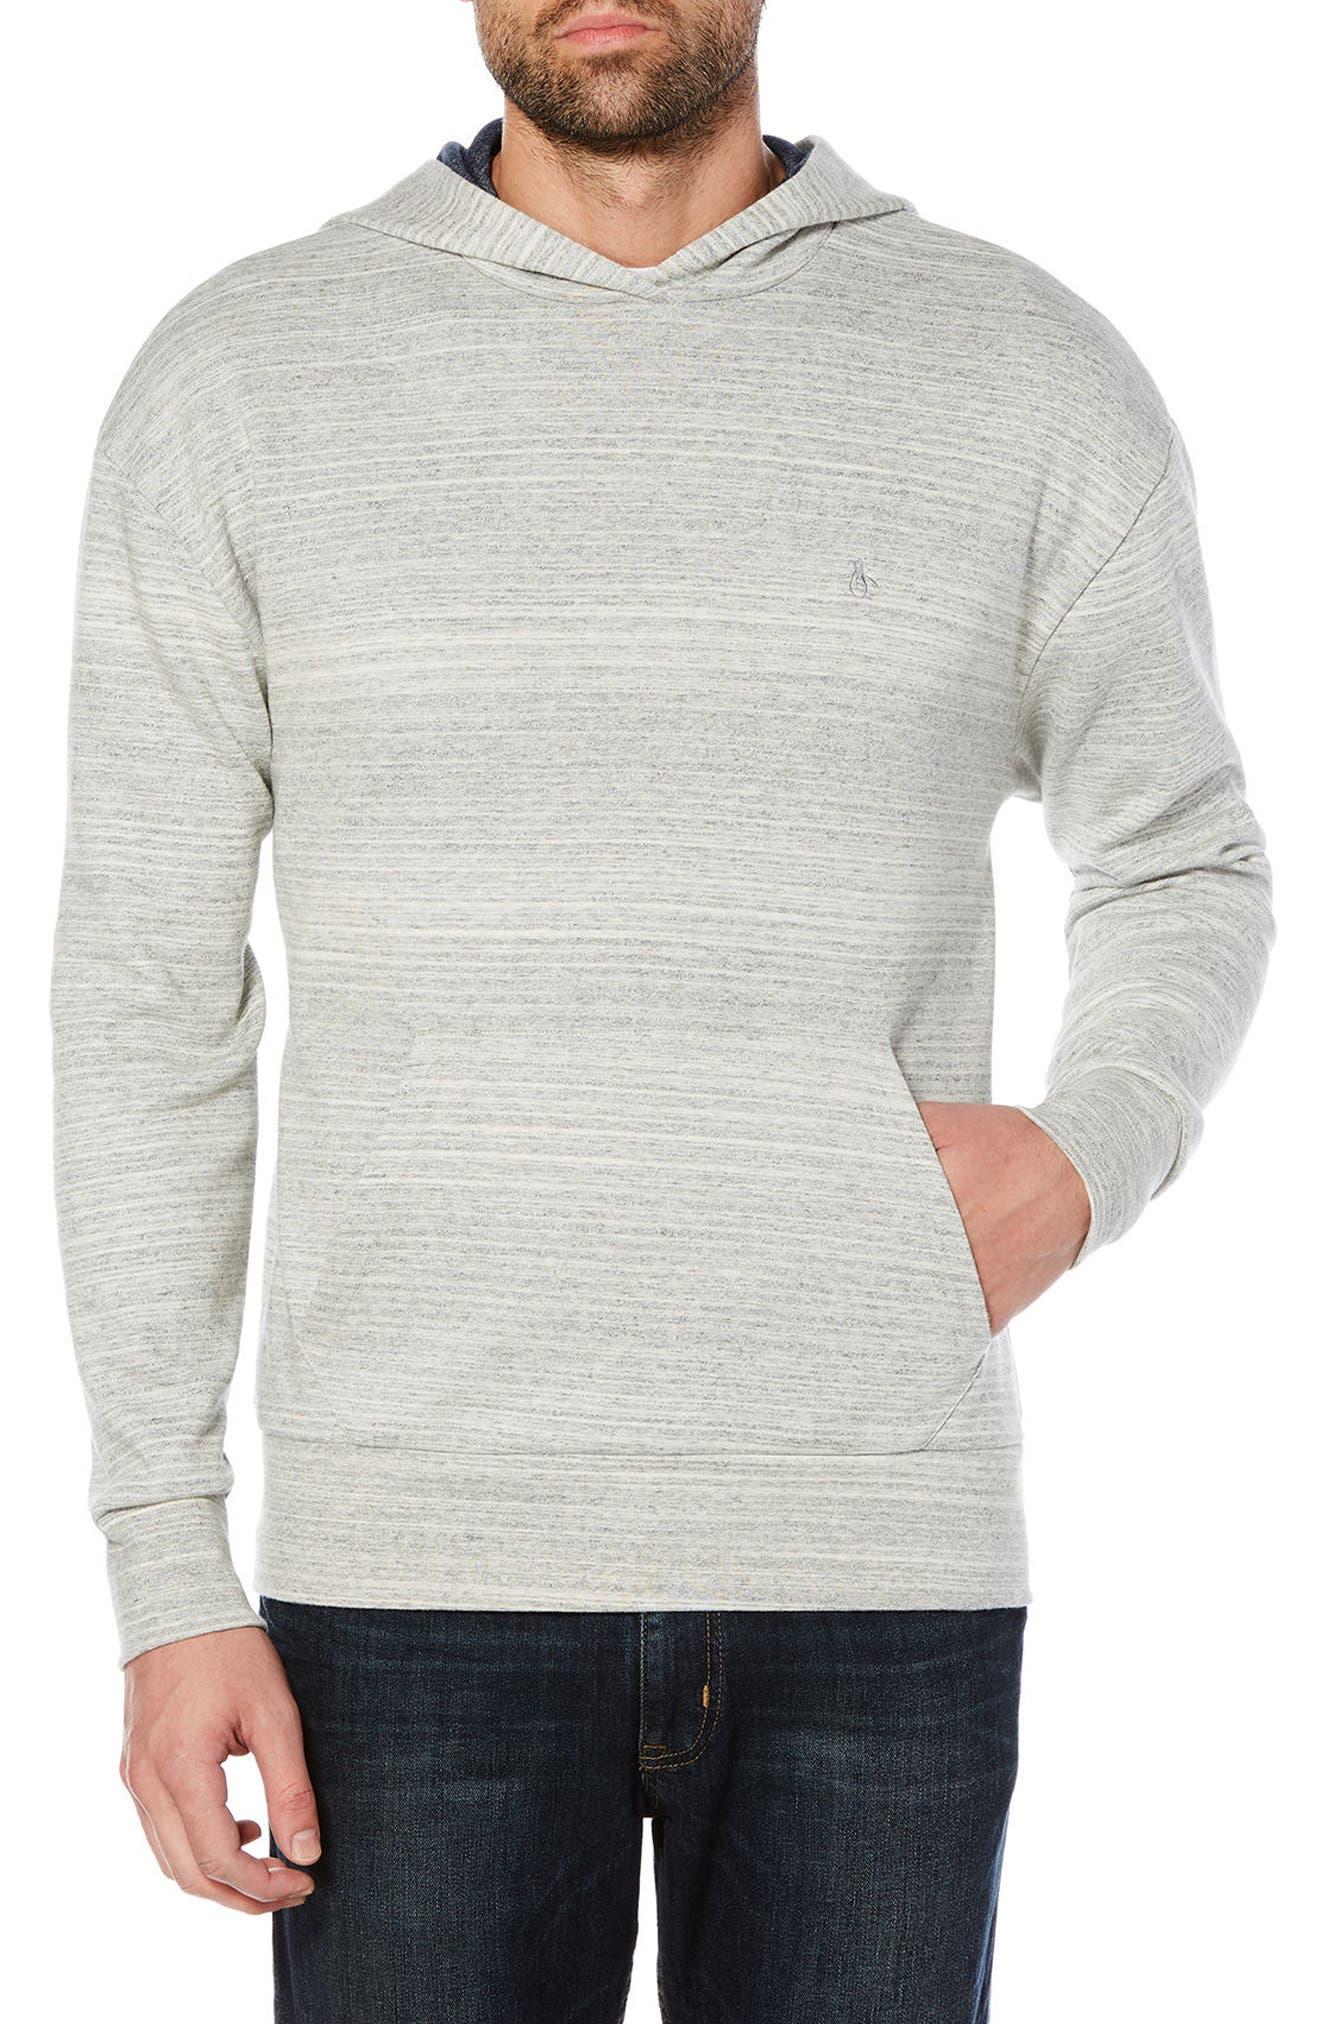 Main Image - Original Penguin Hooded Sweater